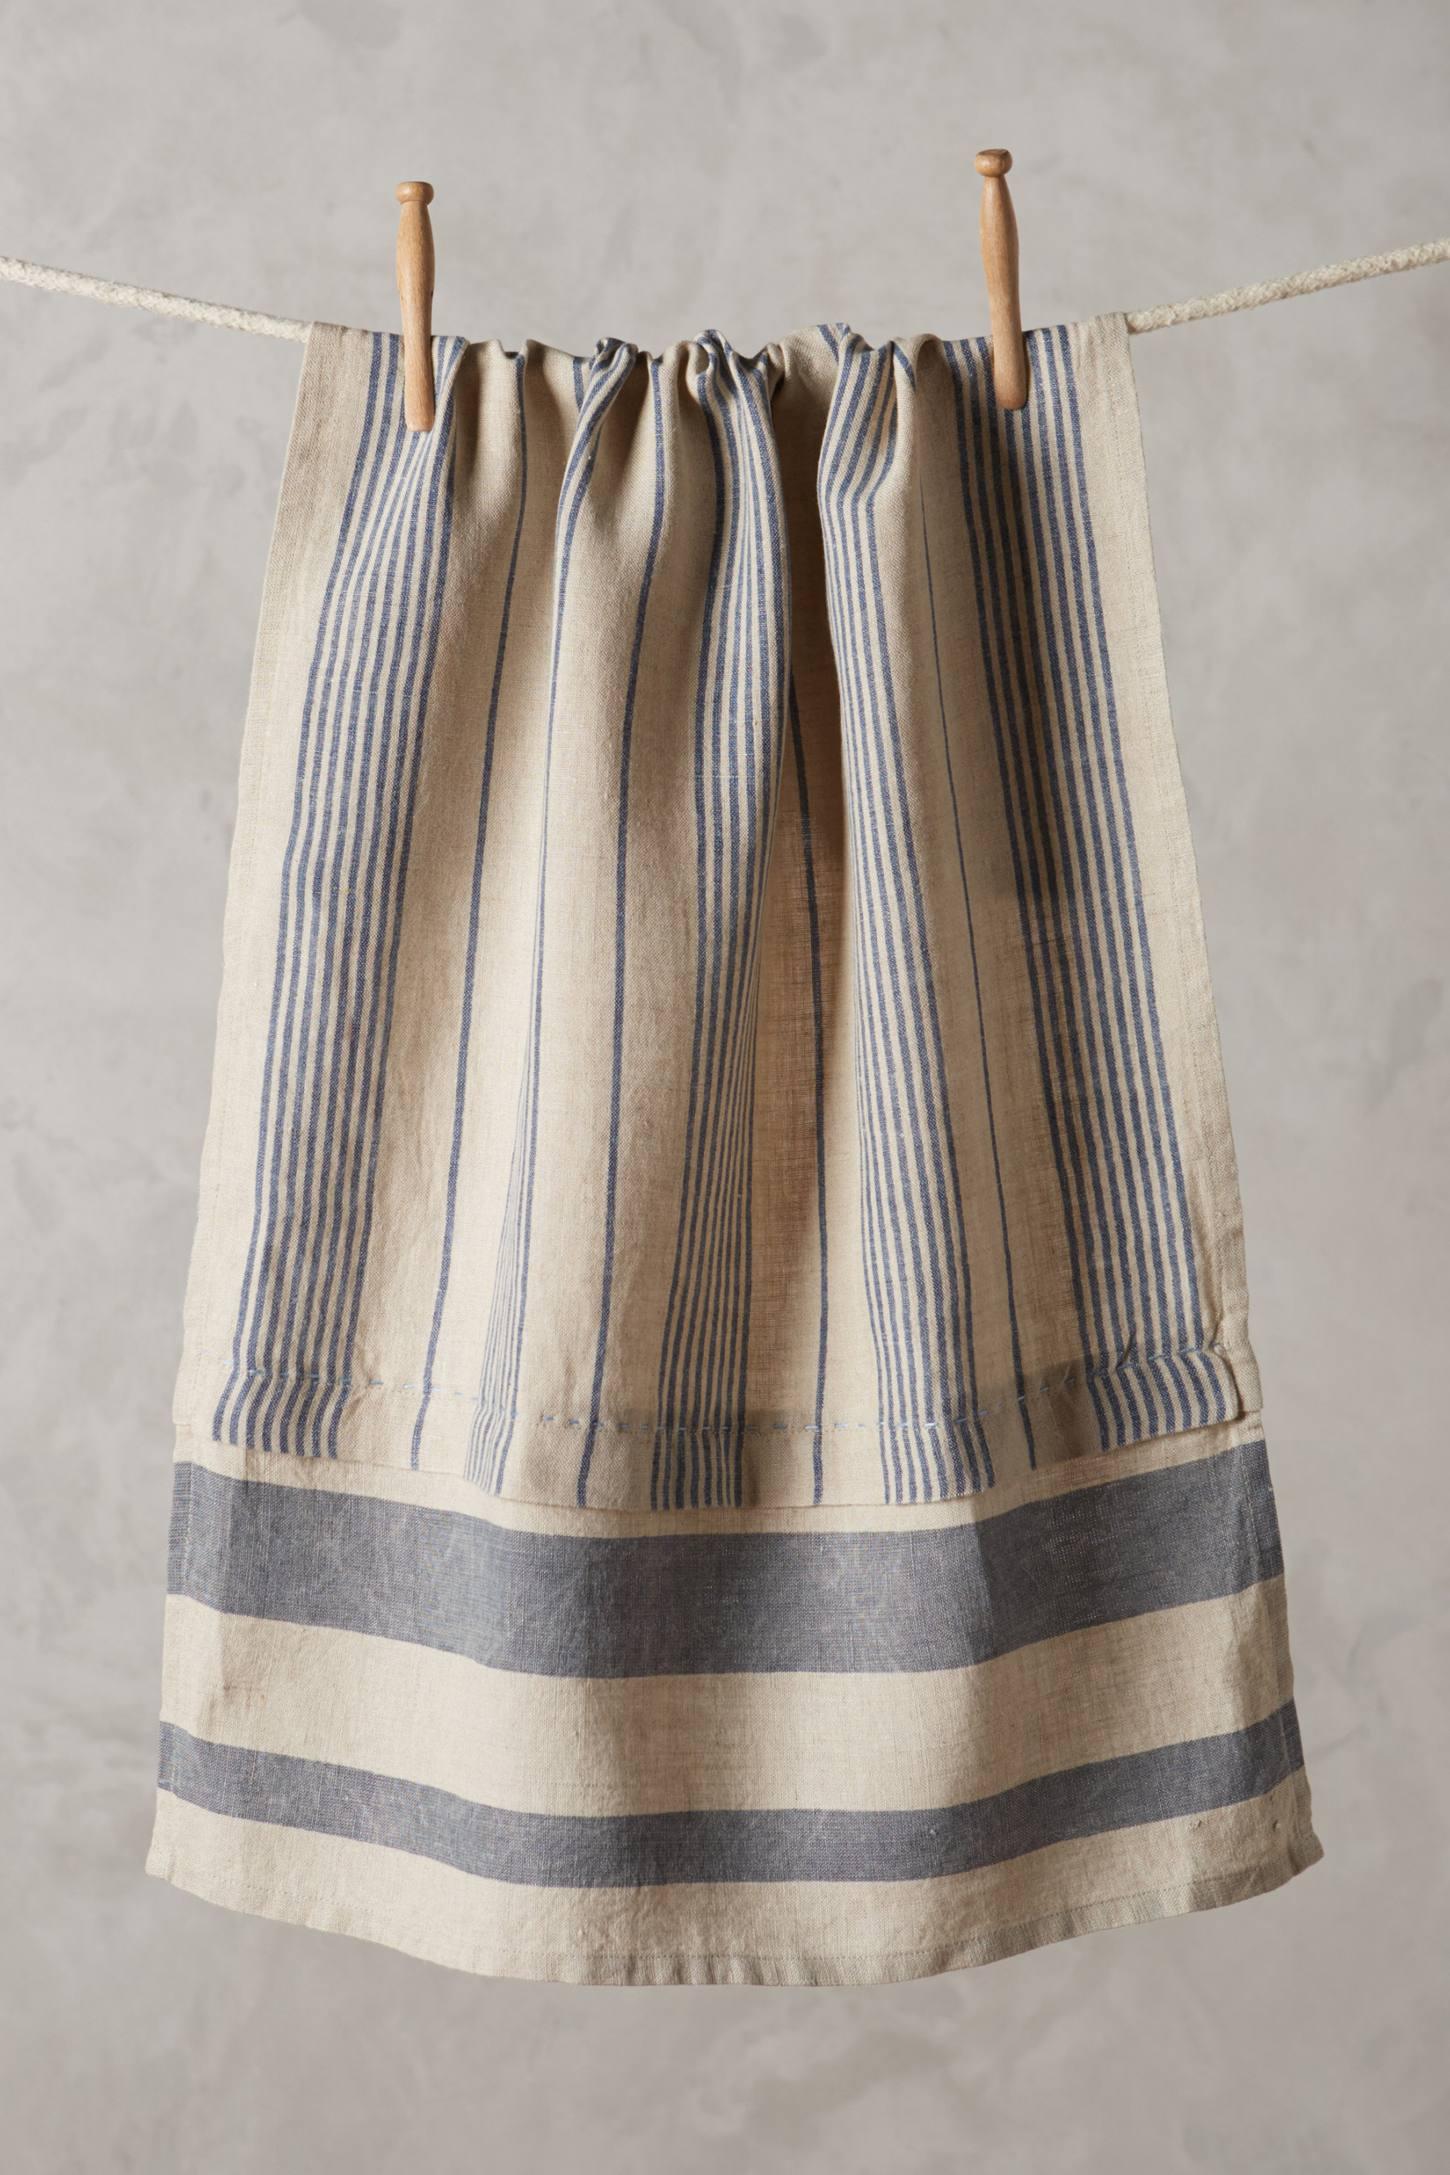 Linen Market Tea Towel